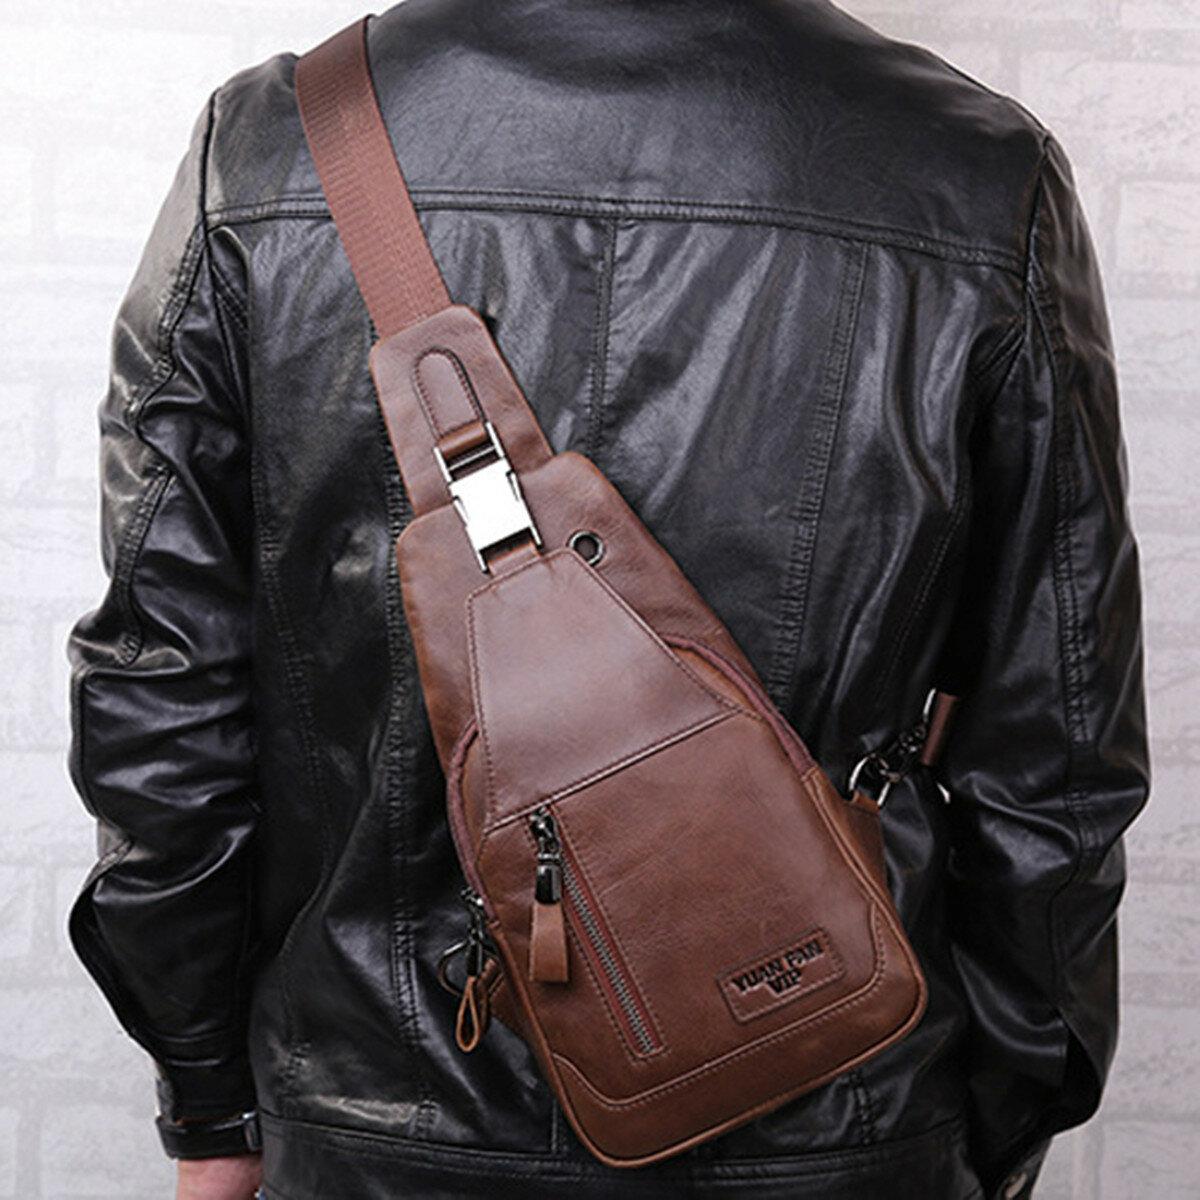 Men Outdoor USB Anti-thfet Multifunctional Large Capacity Waterproof Chest Bag - 2